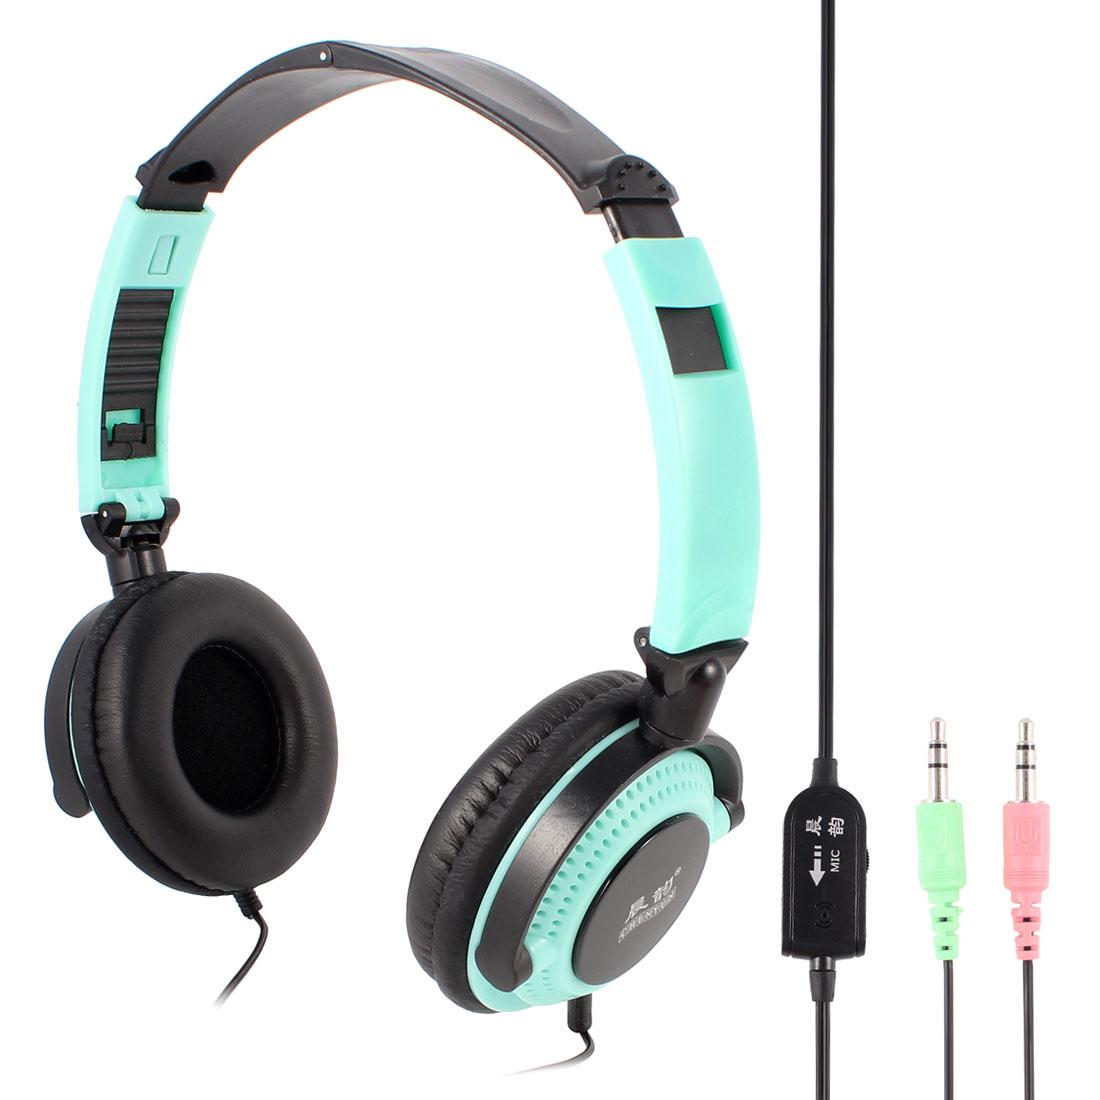 Adjustable Headband 3.5mm Connector Stereo Headphone Headset Black Cyan for PC Laptop